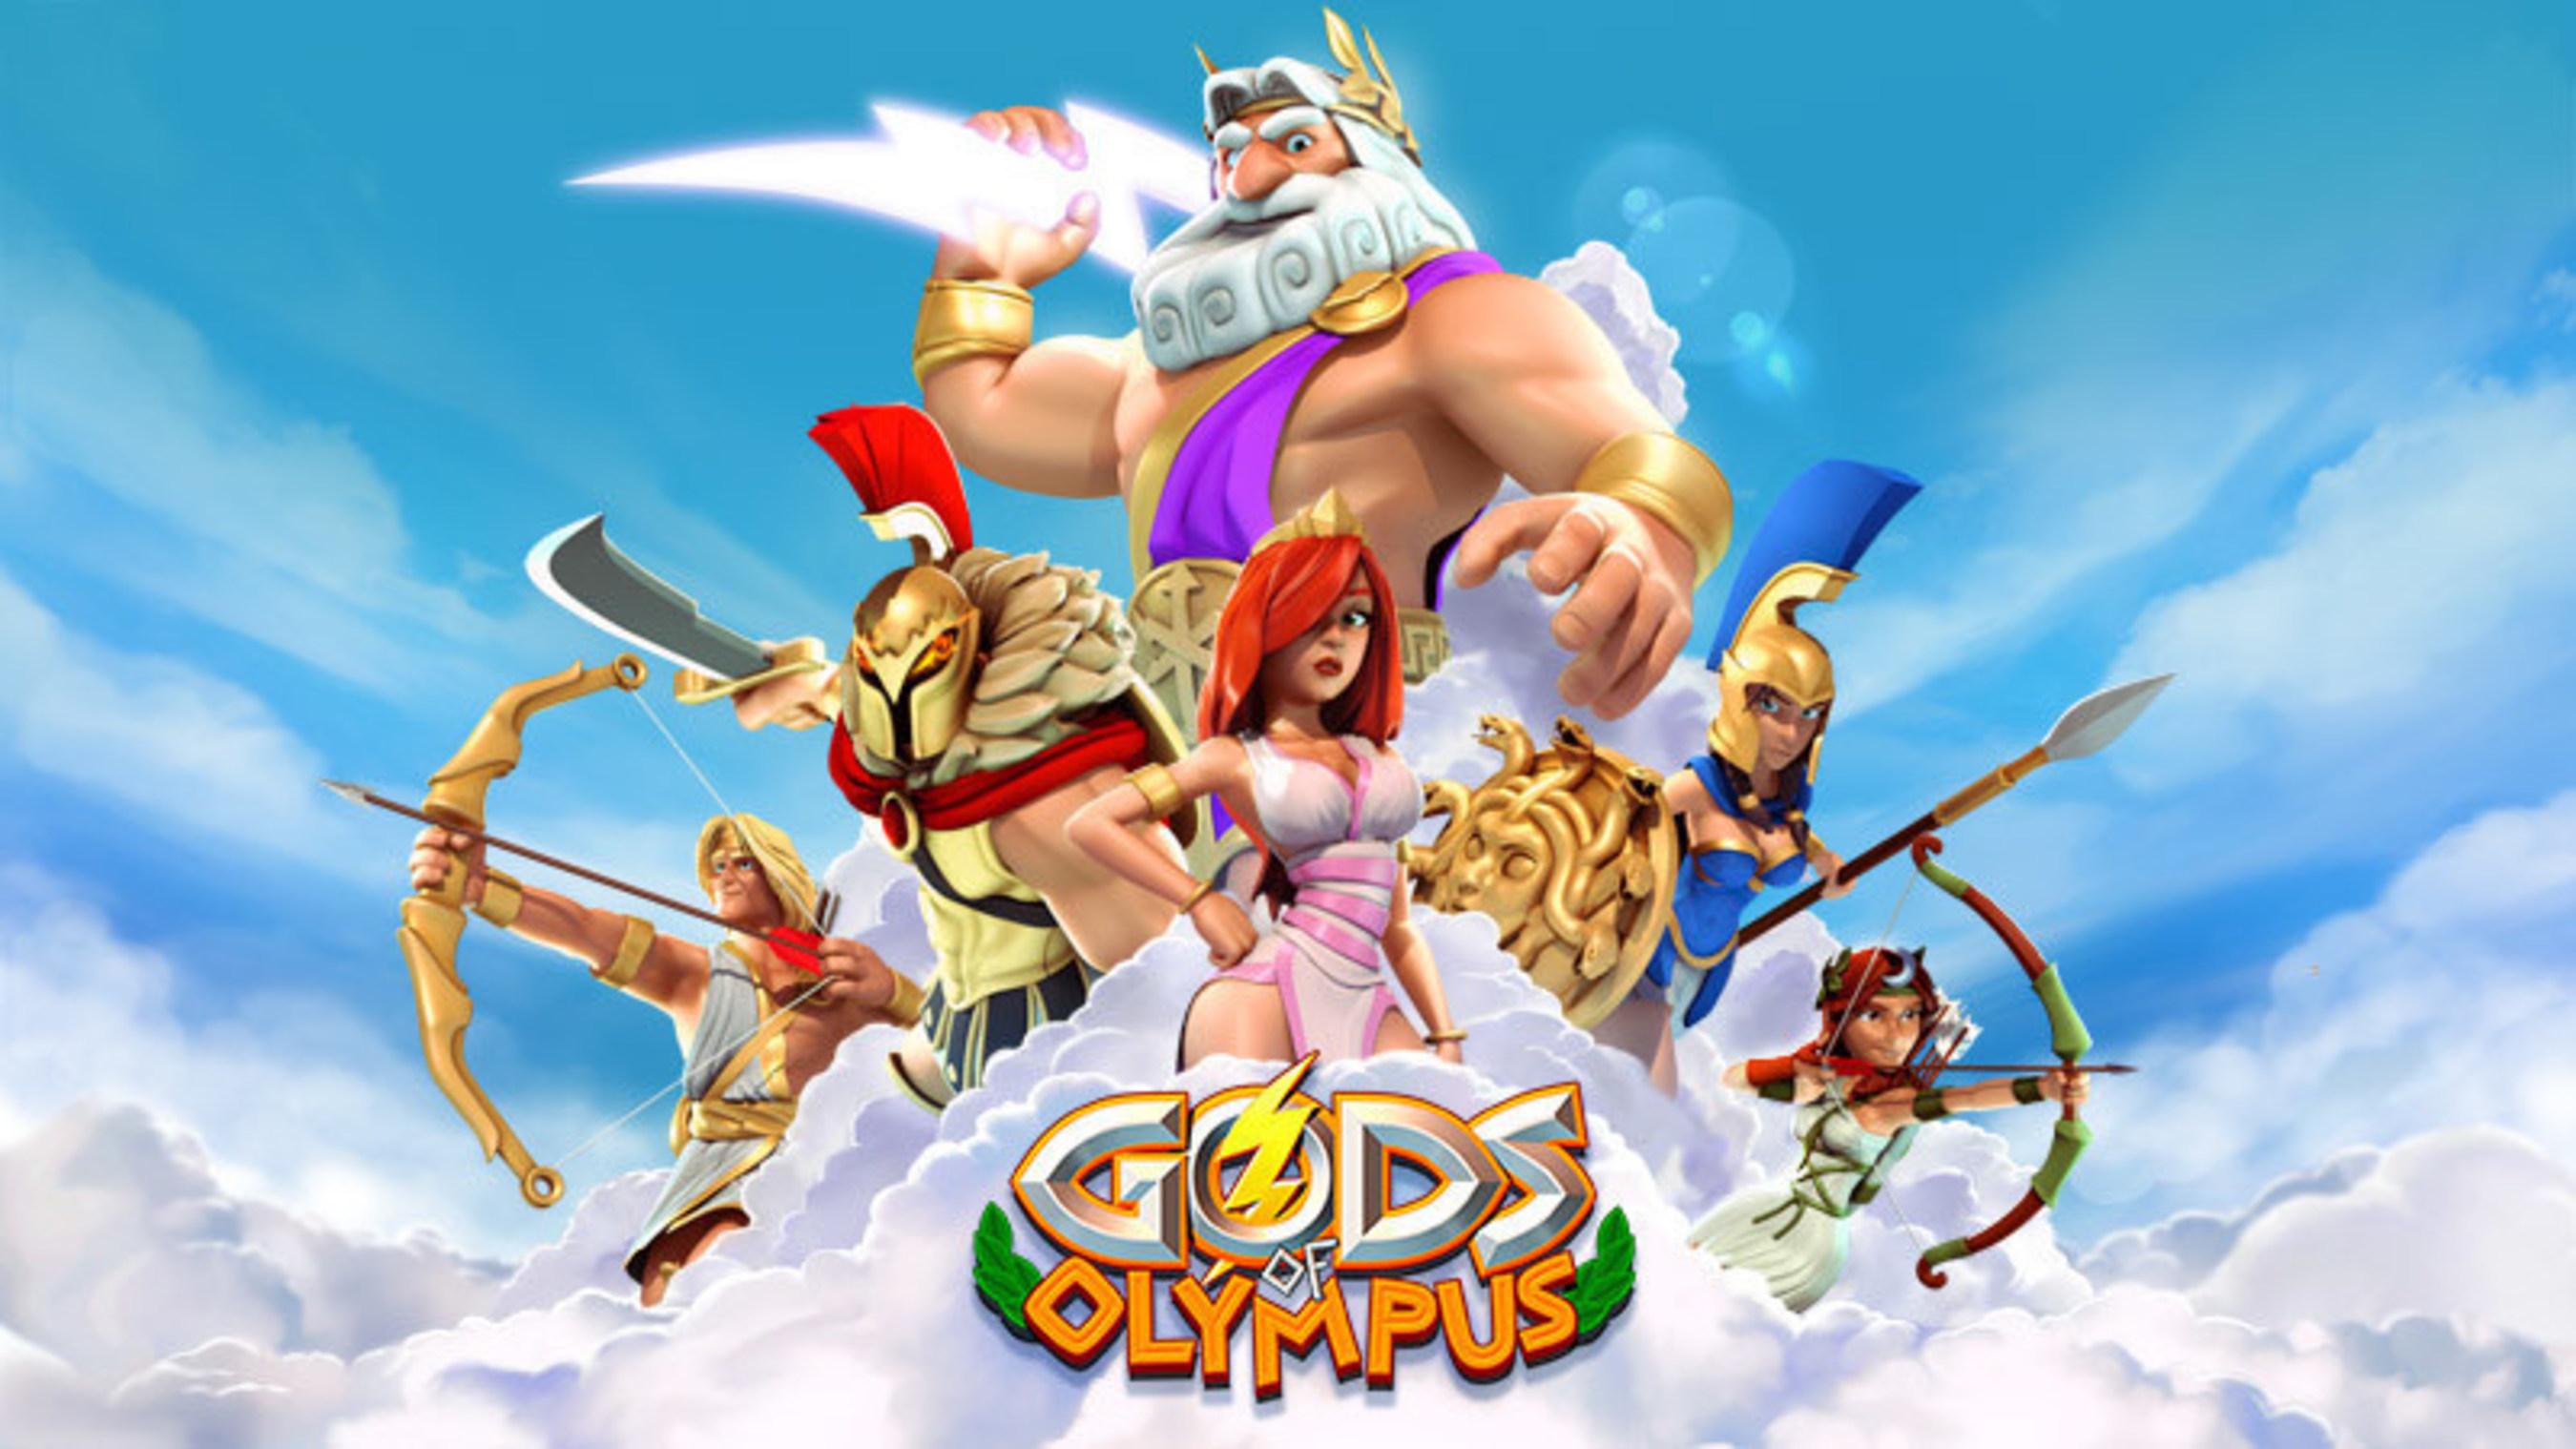 Gods of Olympus Thunders into iOS App Store